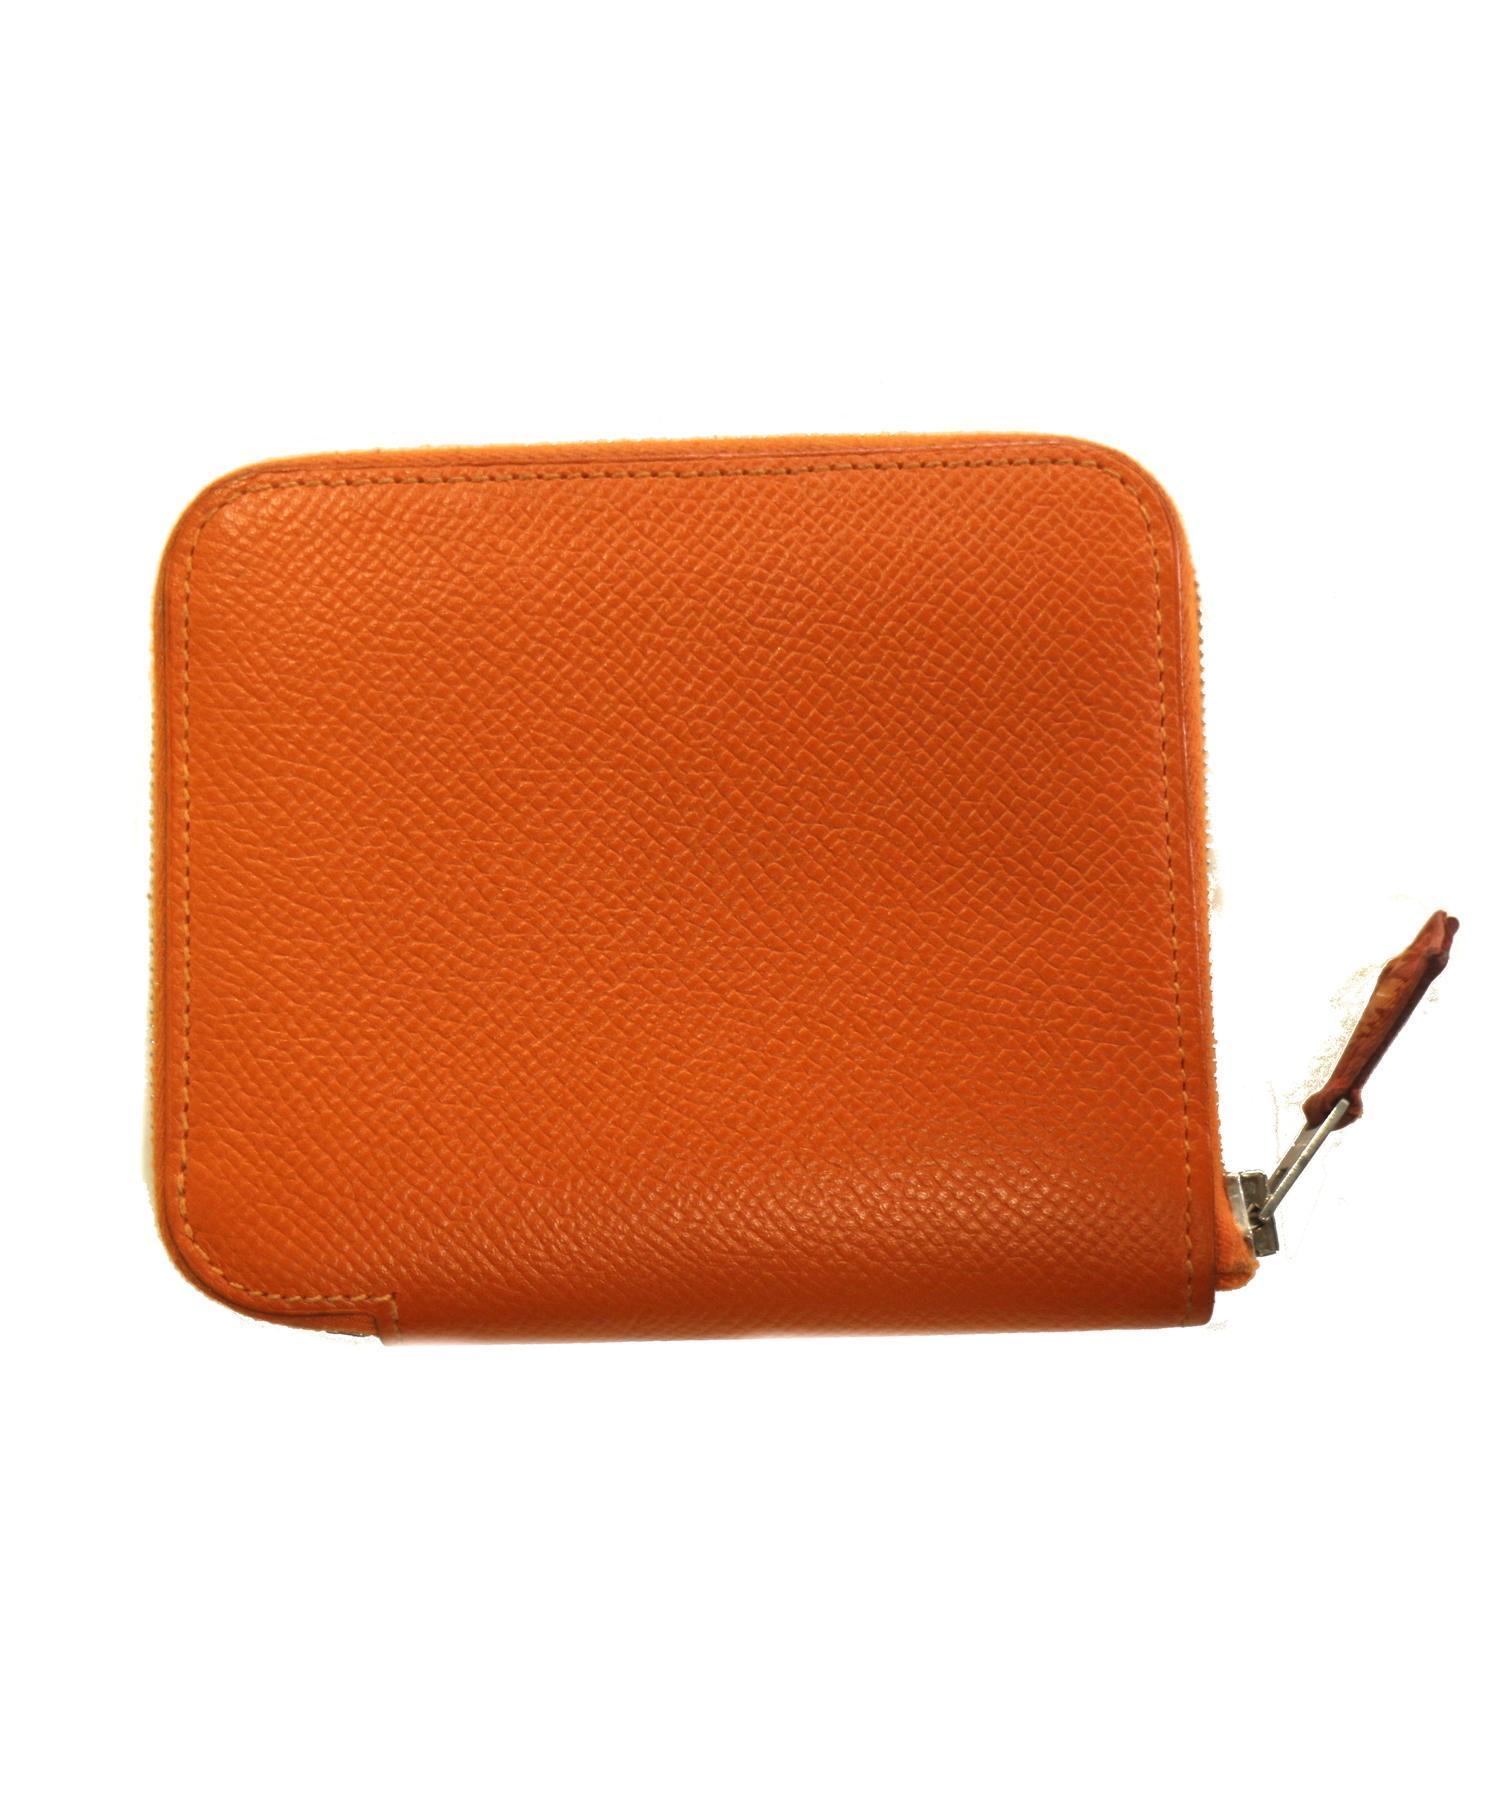 huge selection of c784b daf4e [中古]HERMES(エルメス)のレディース 服飾小物 シルクインコンパクトラウンドファスナー財布